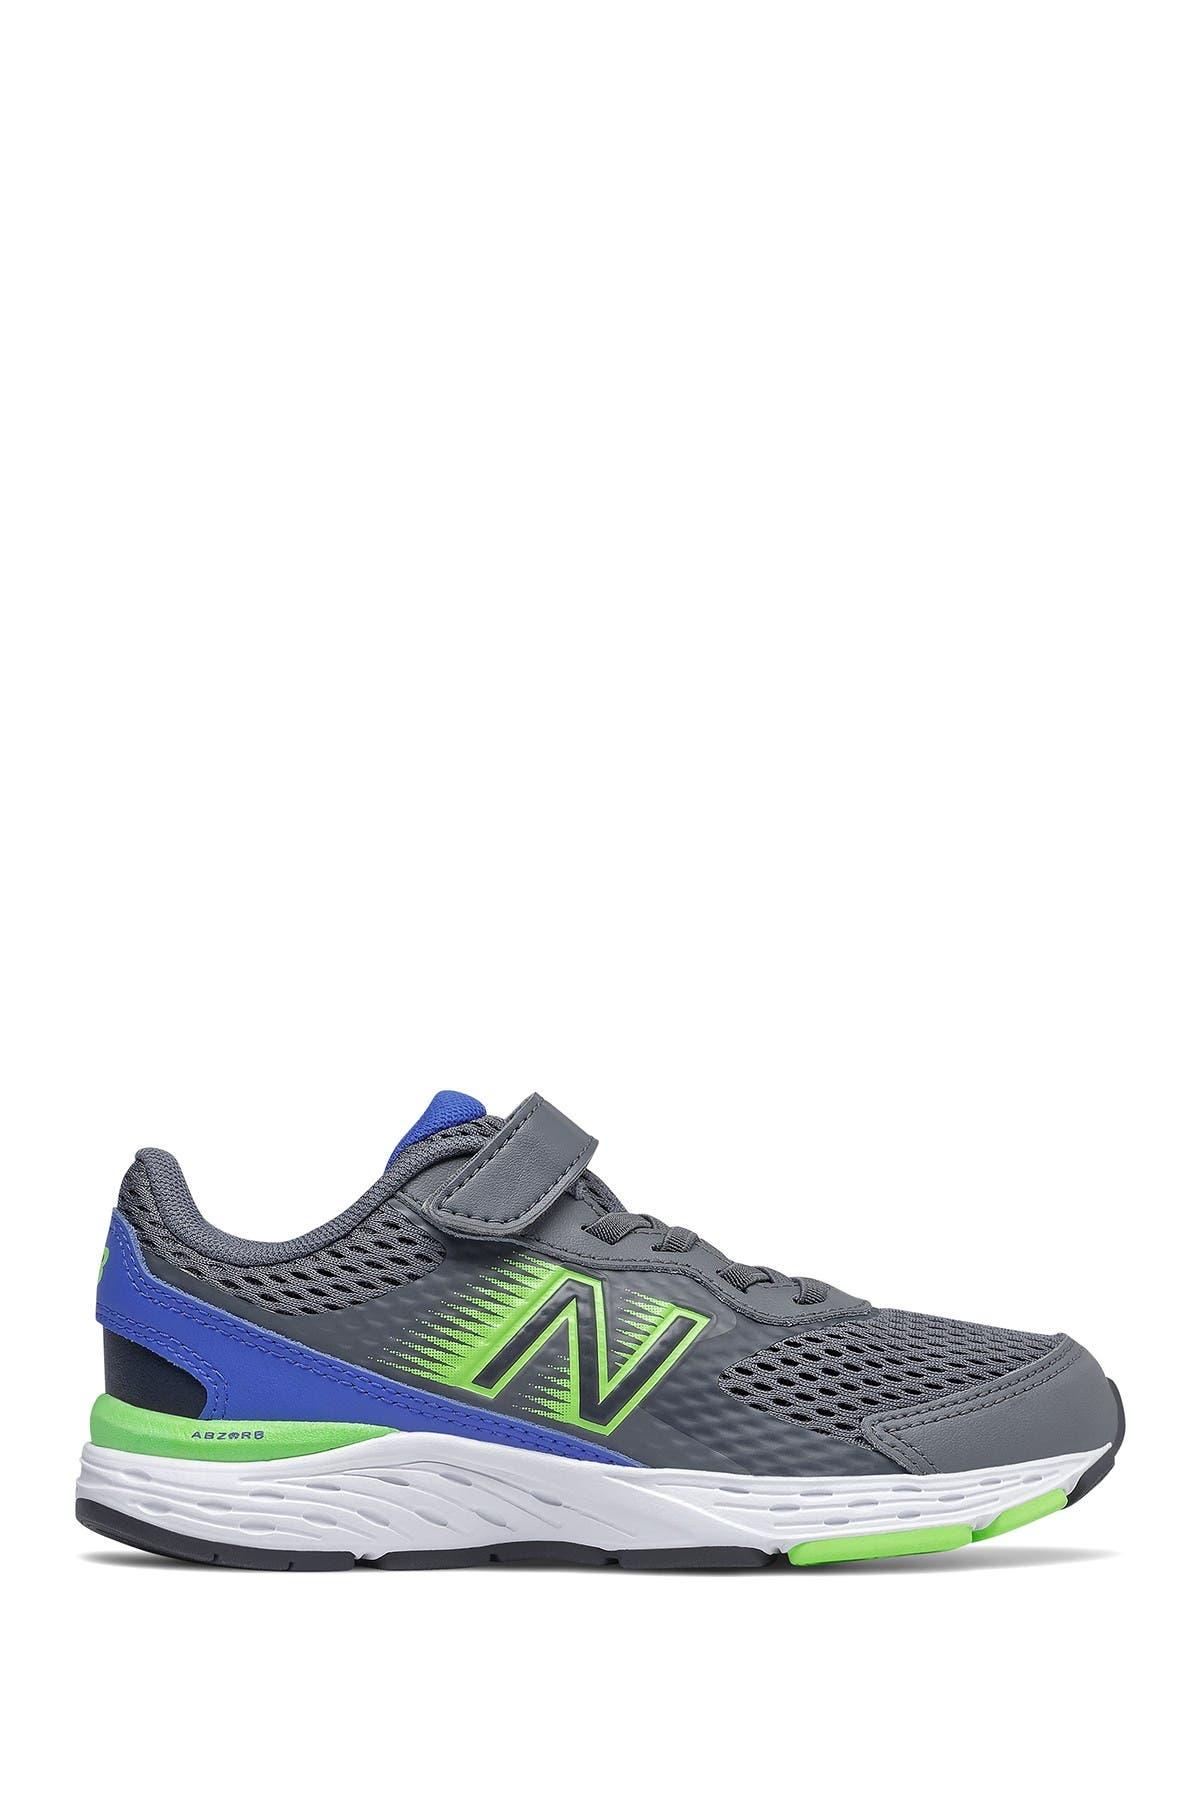 New Balance Kids' Boys' Shoes